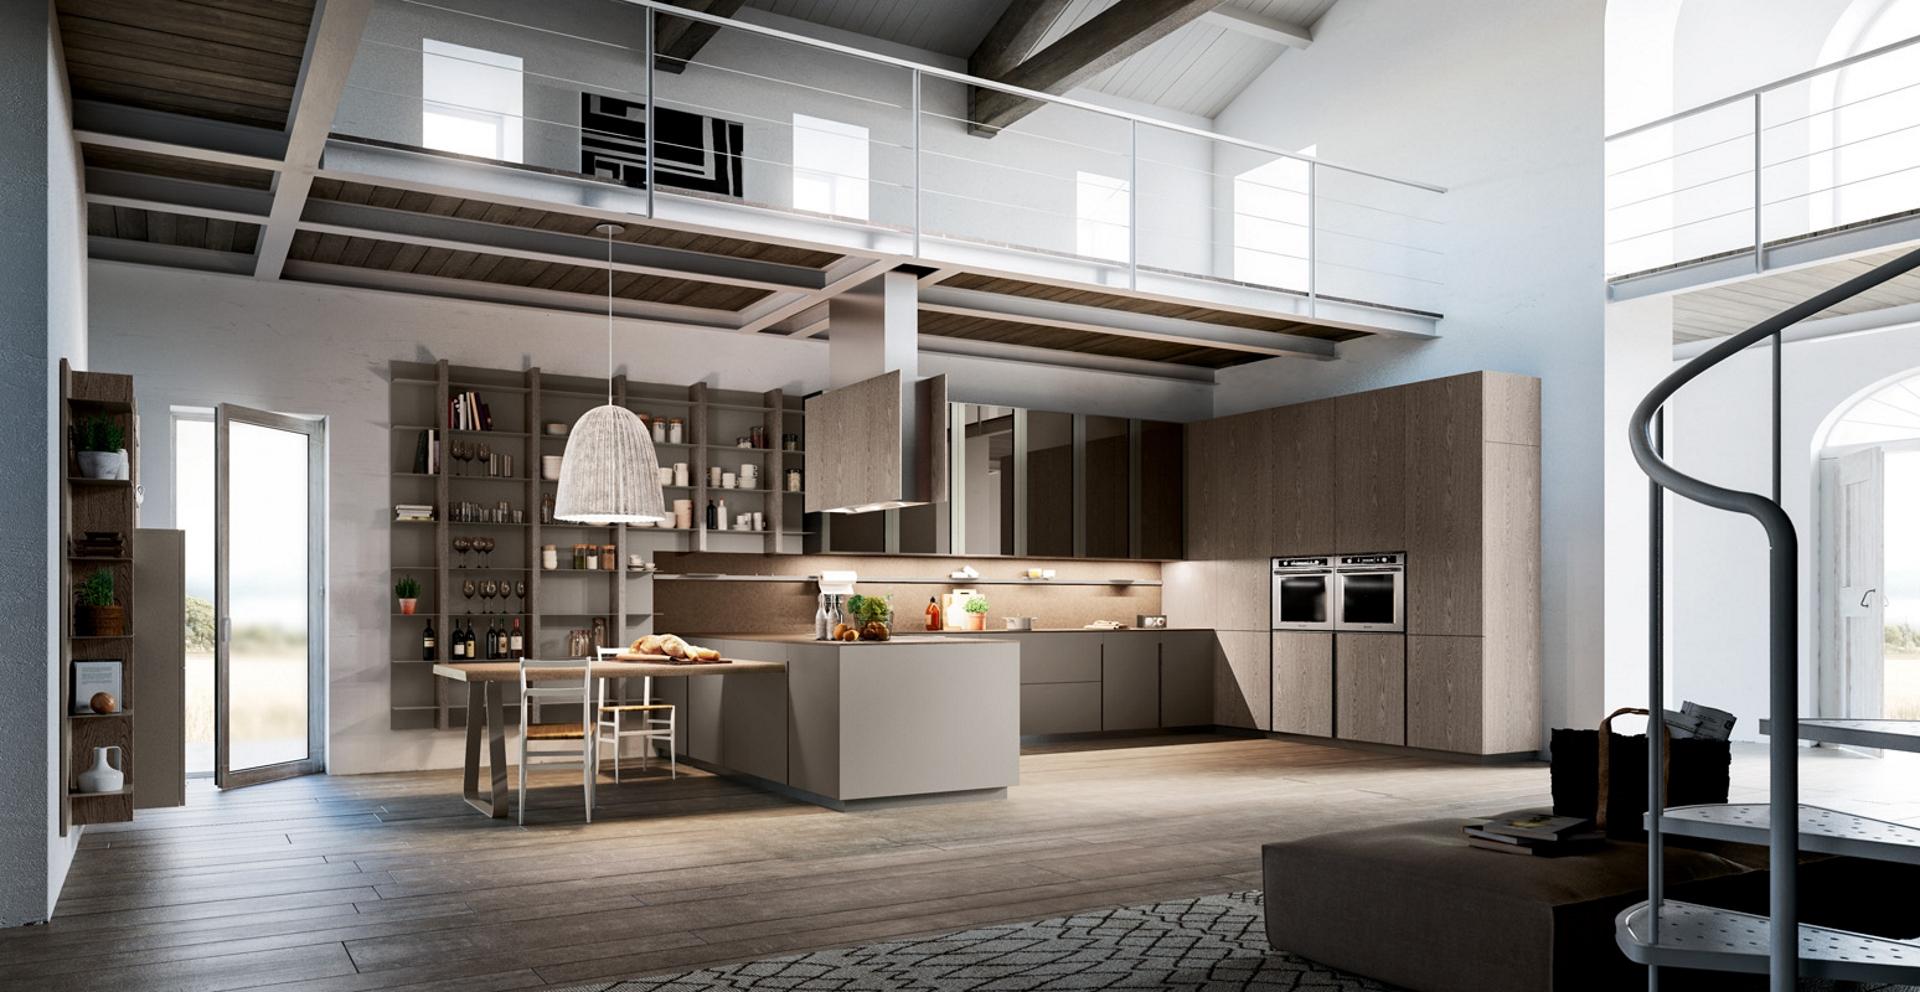 Lounge cucina moderna abbinata al living cucine composit - Cucine living moderne ...